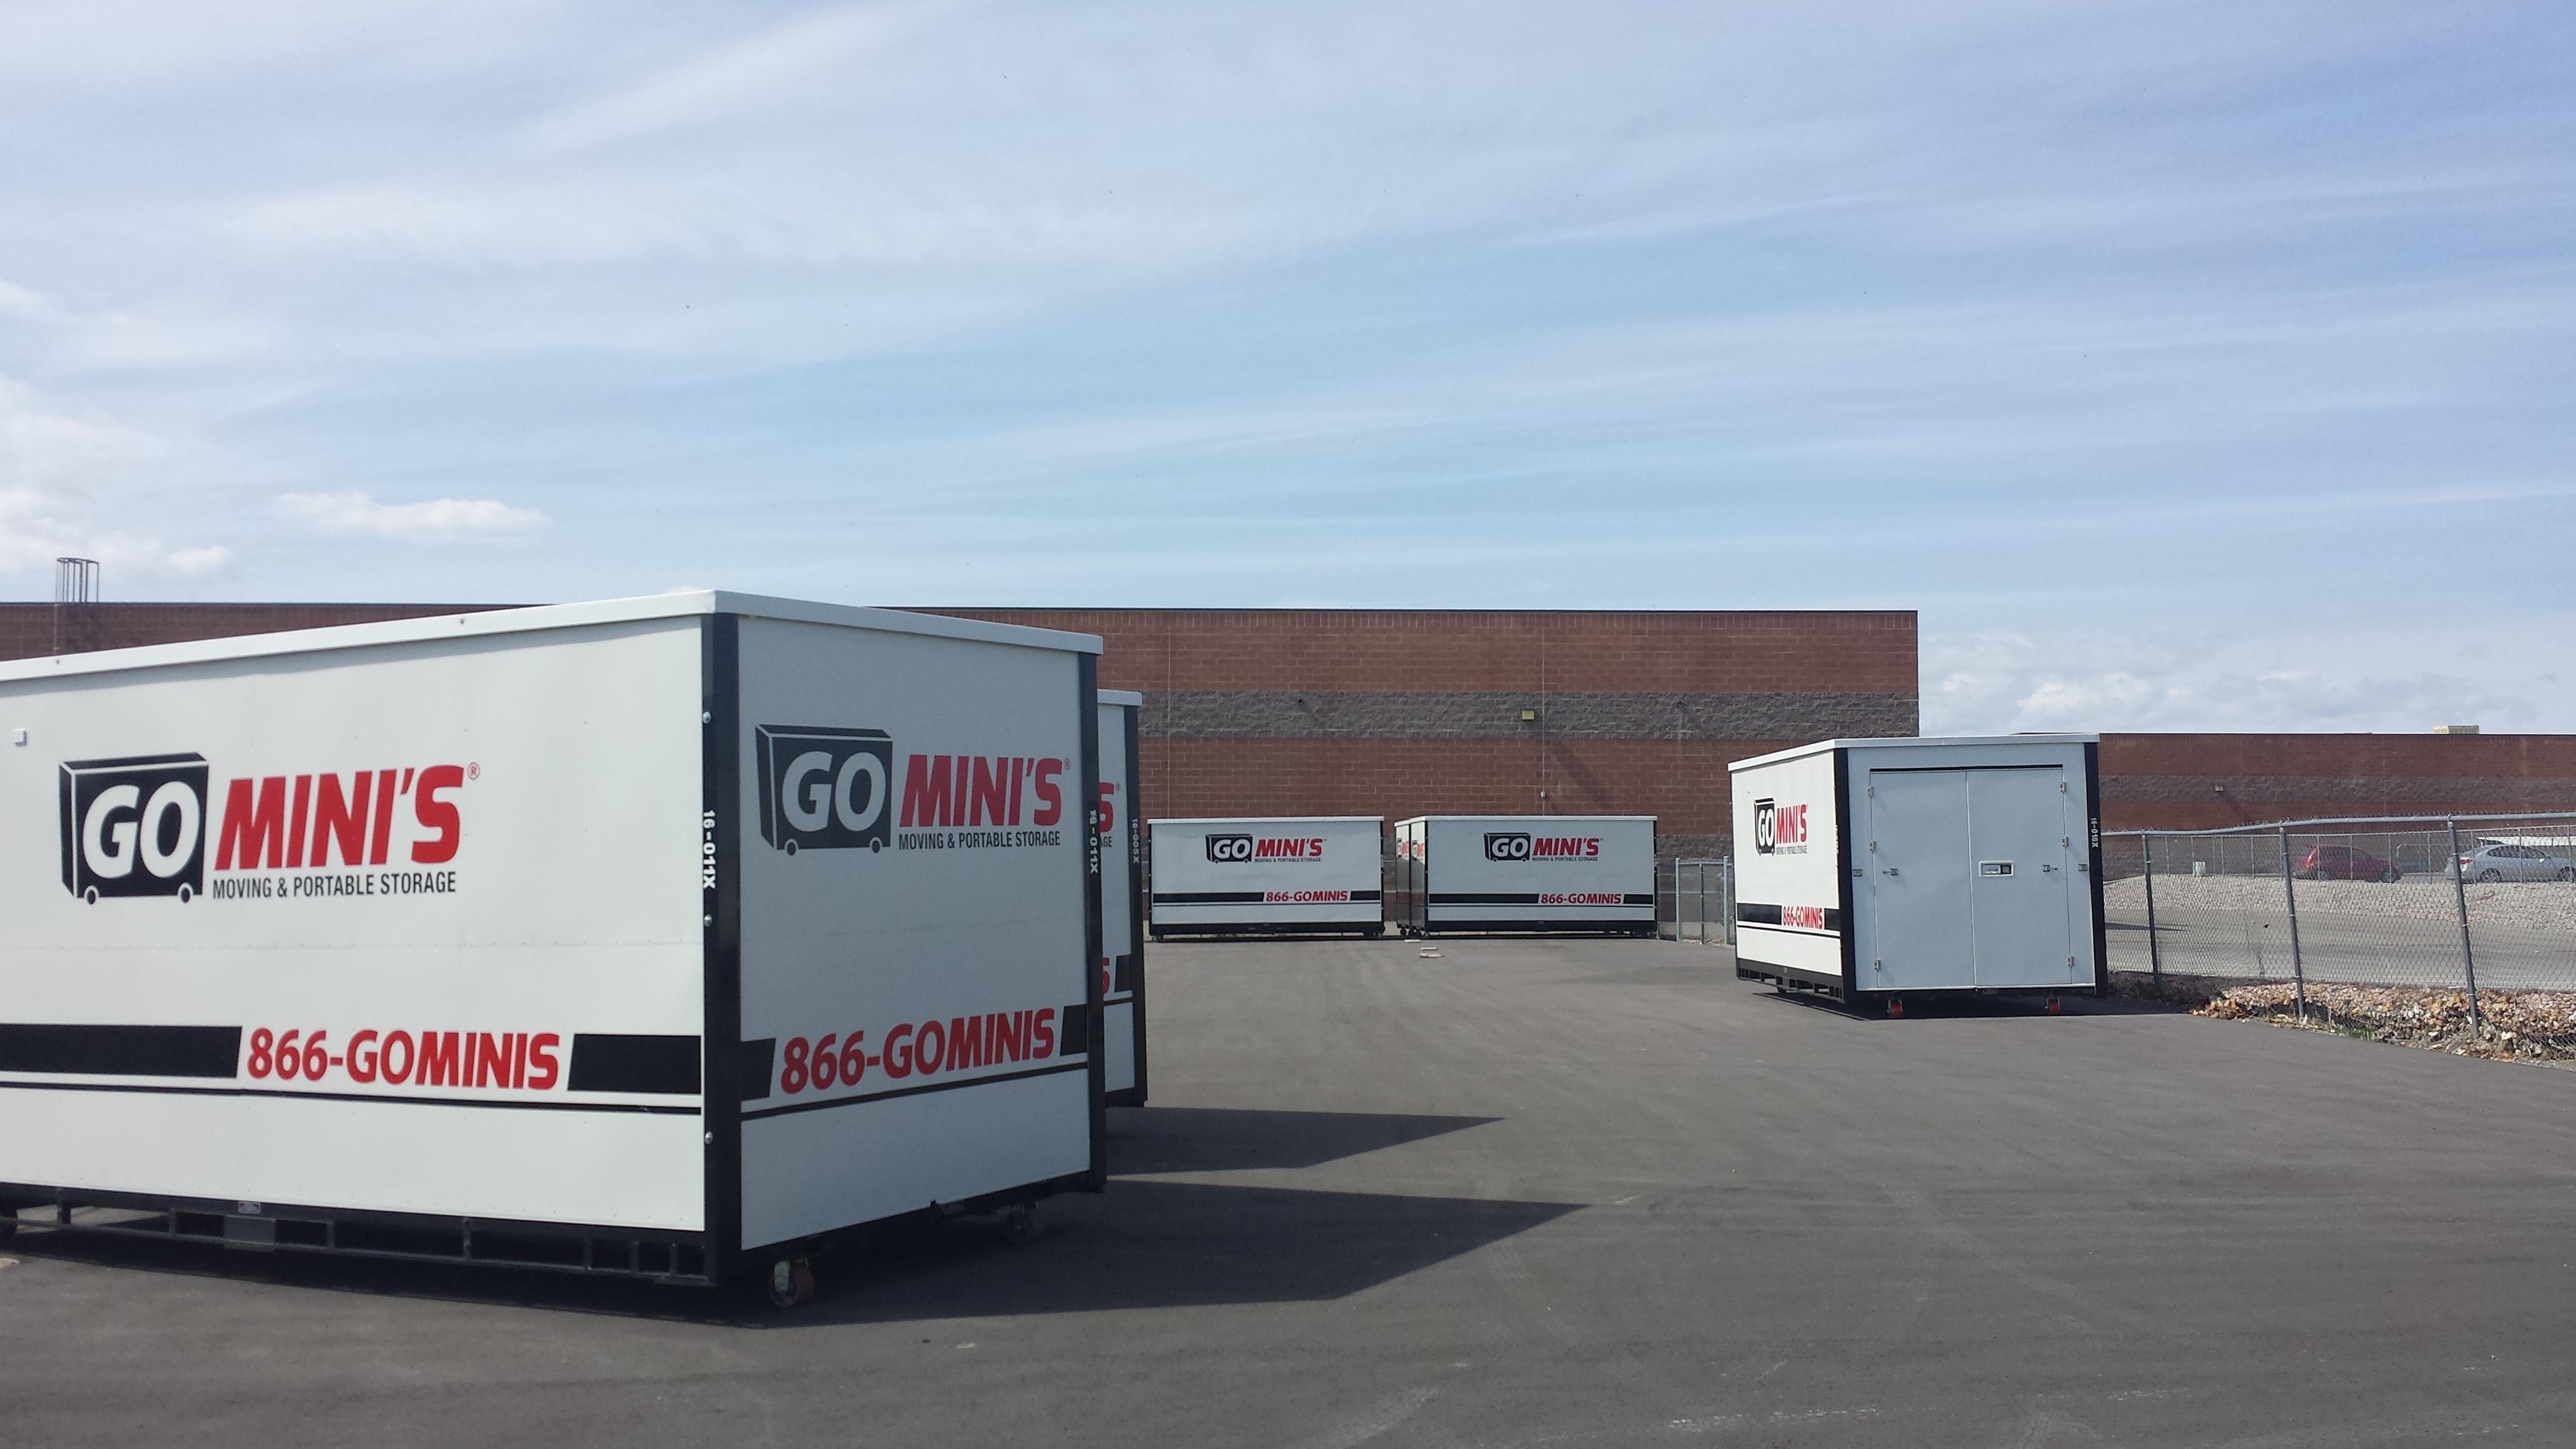 Go Mini's Moving & Portable Storage image 20